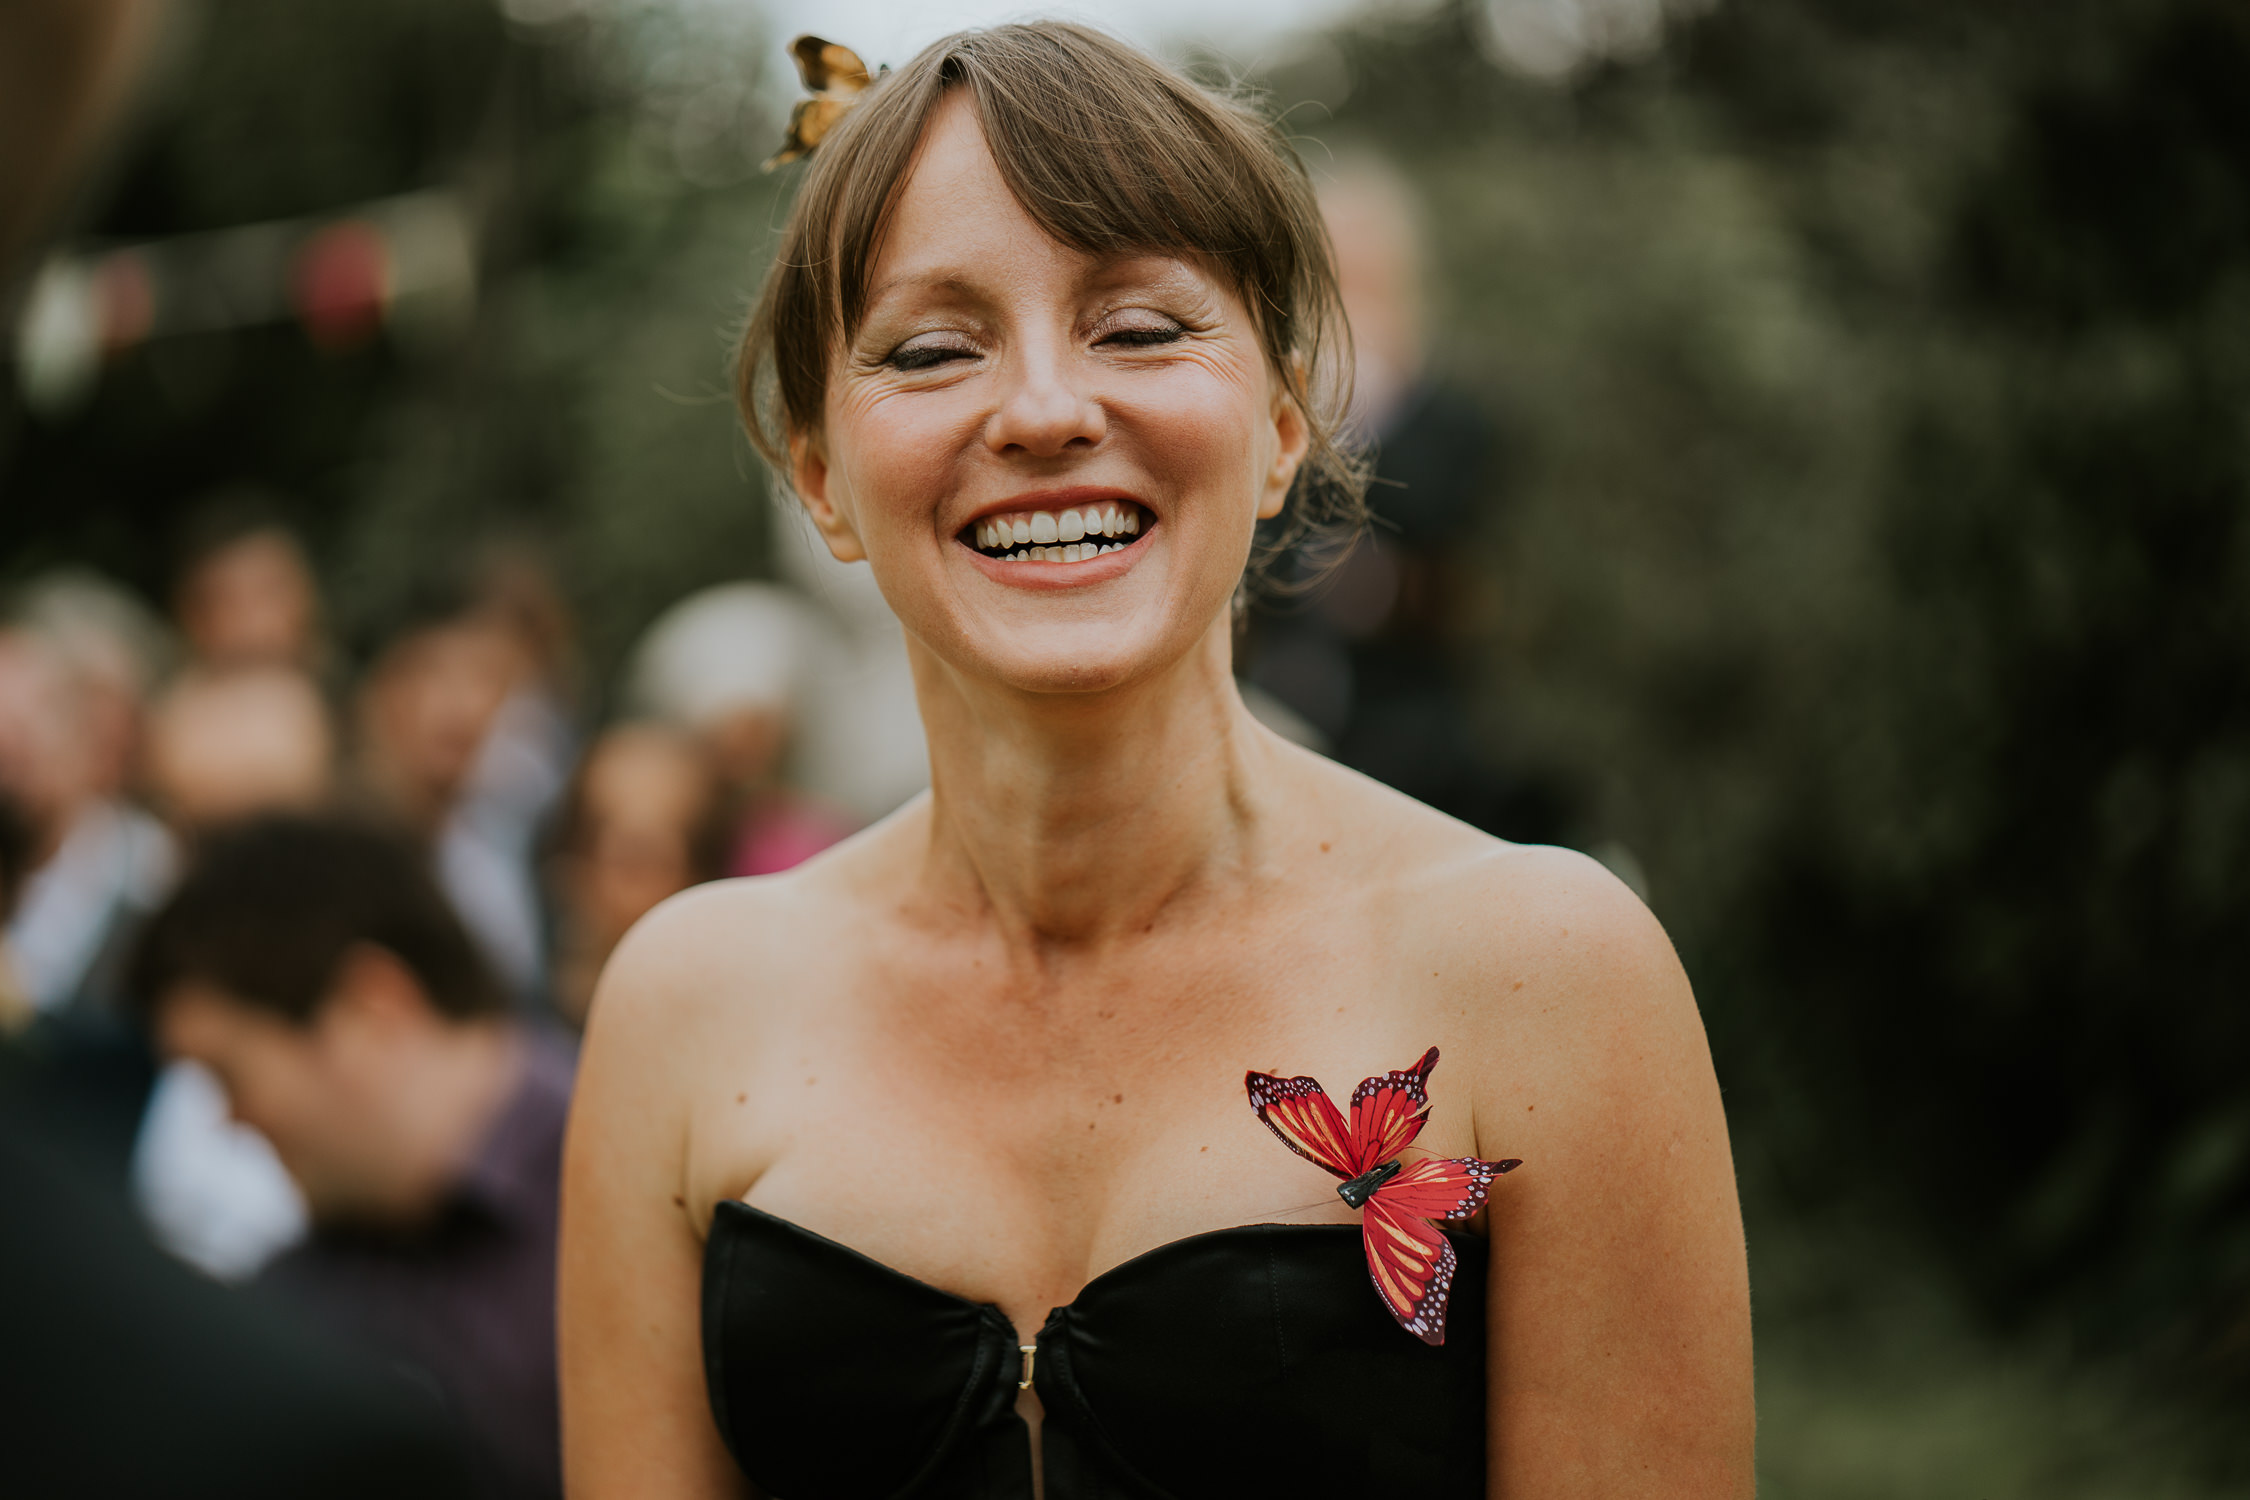 bruidsfotografie-amsterdam-utrecht-trouwfotograaf-mark-hadden-wedding-photography-Cathrin-Michael-218.jpg